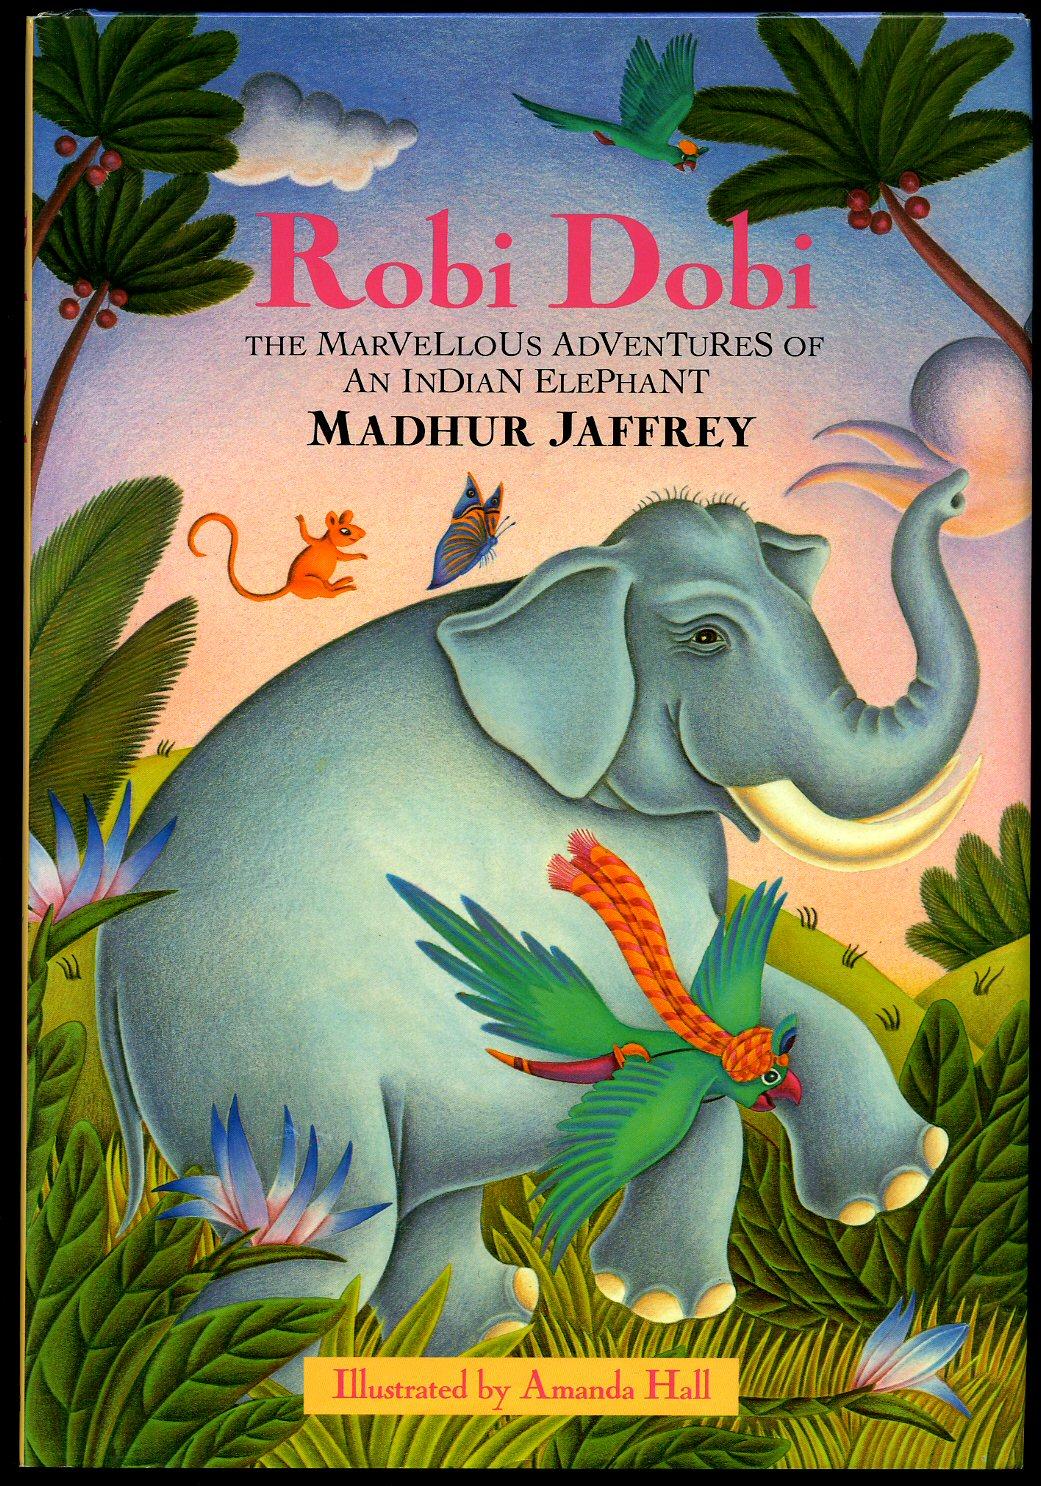 JAFFREY, MADHUR [ILLUSTRATED BY AMANDA HALL] - Robi Dobi; The Marvellous Adventures of an Indian Elephant